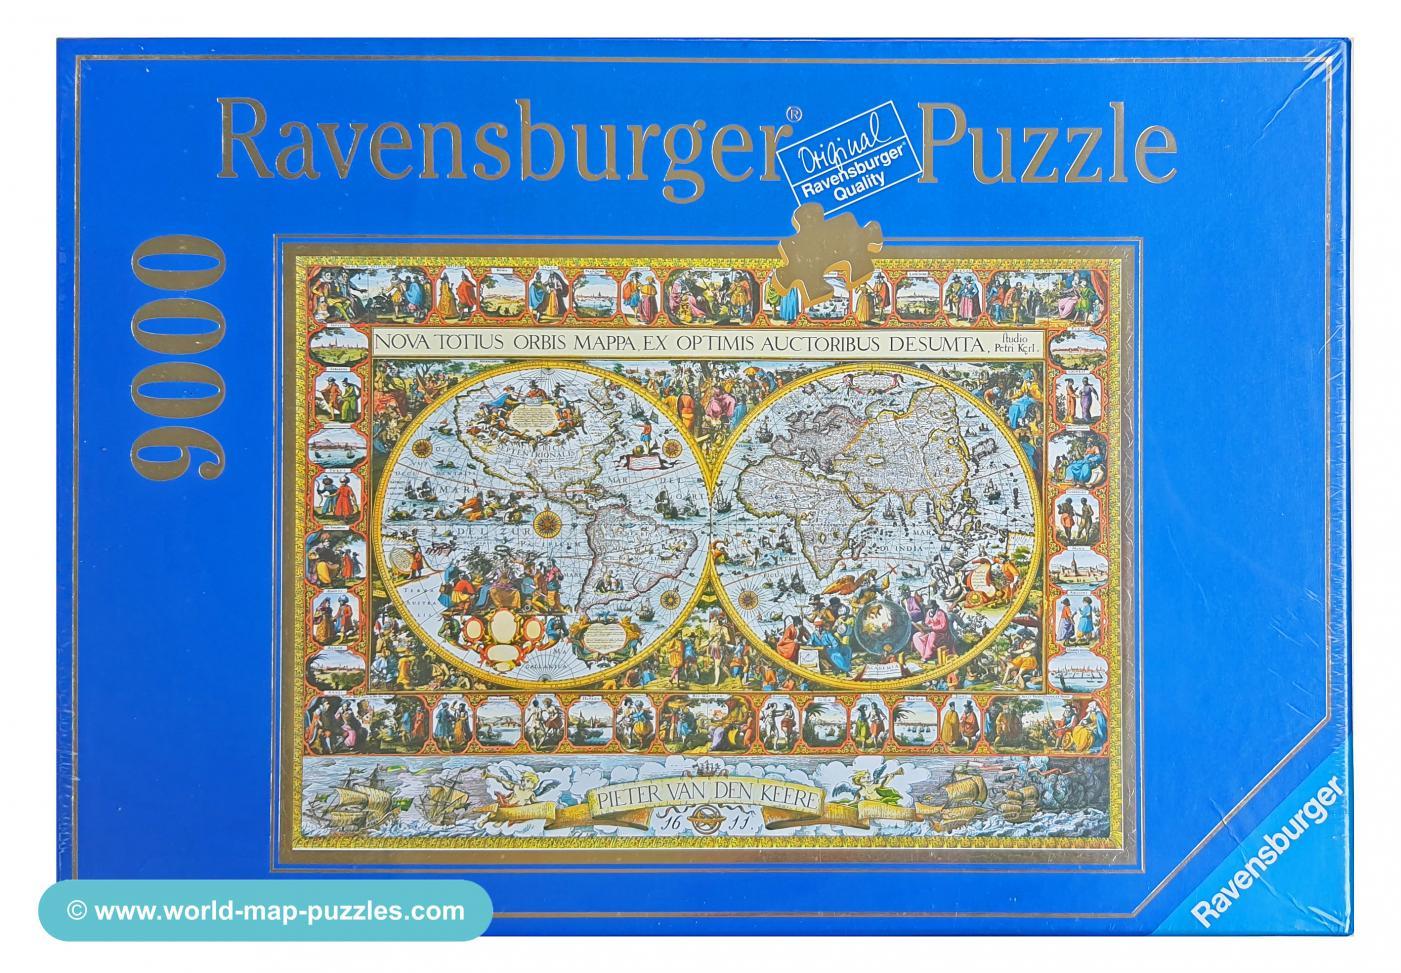 C mh 0029 Ravensburger 9000